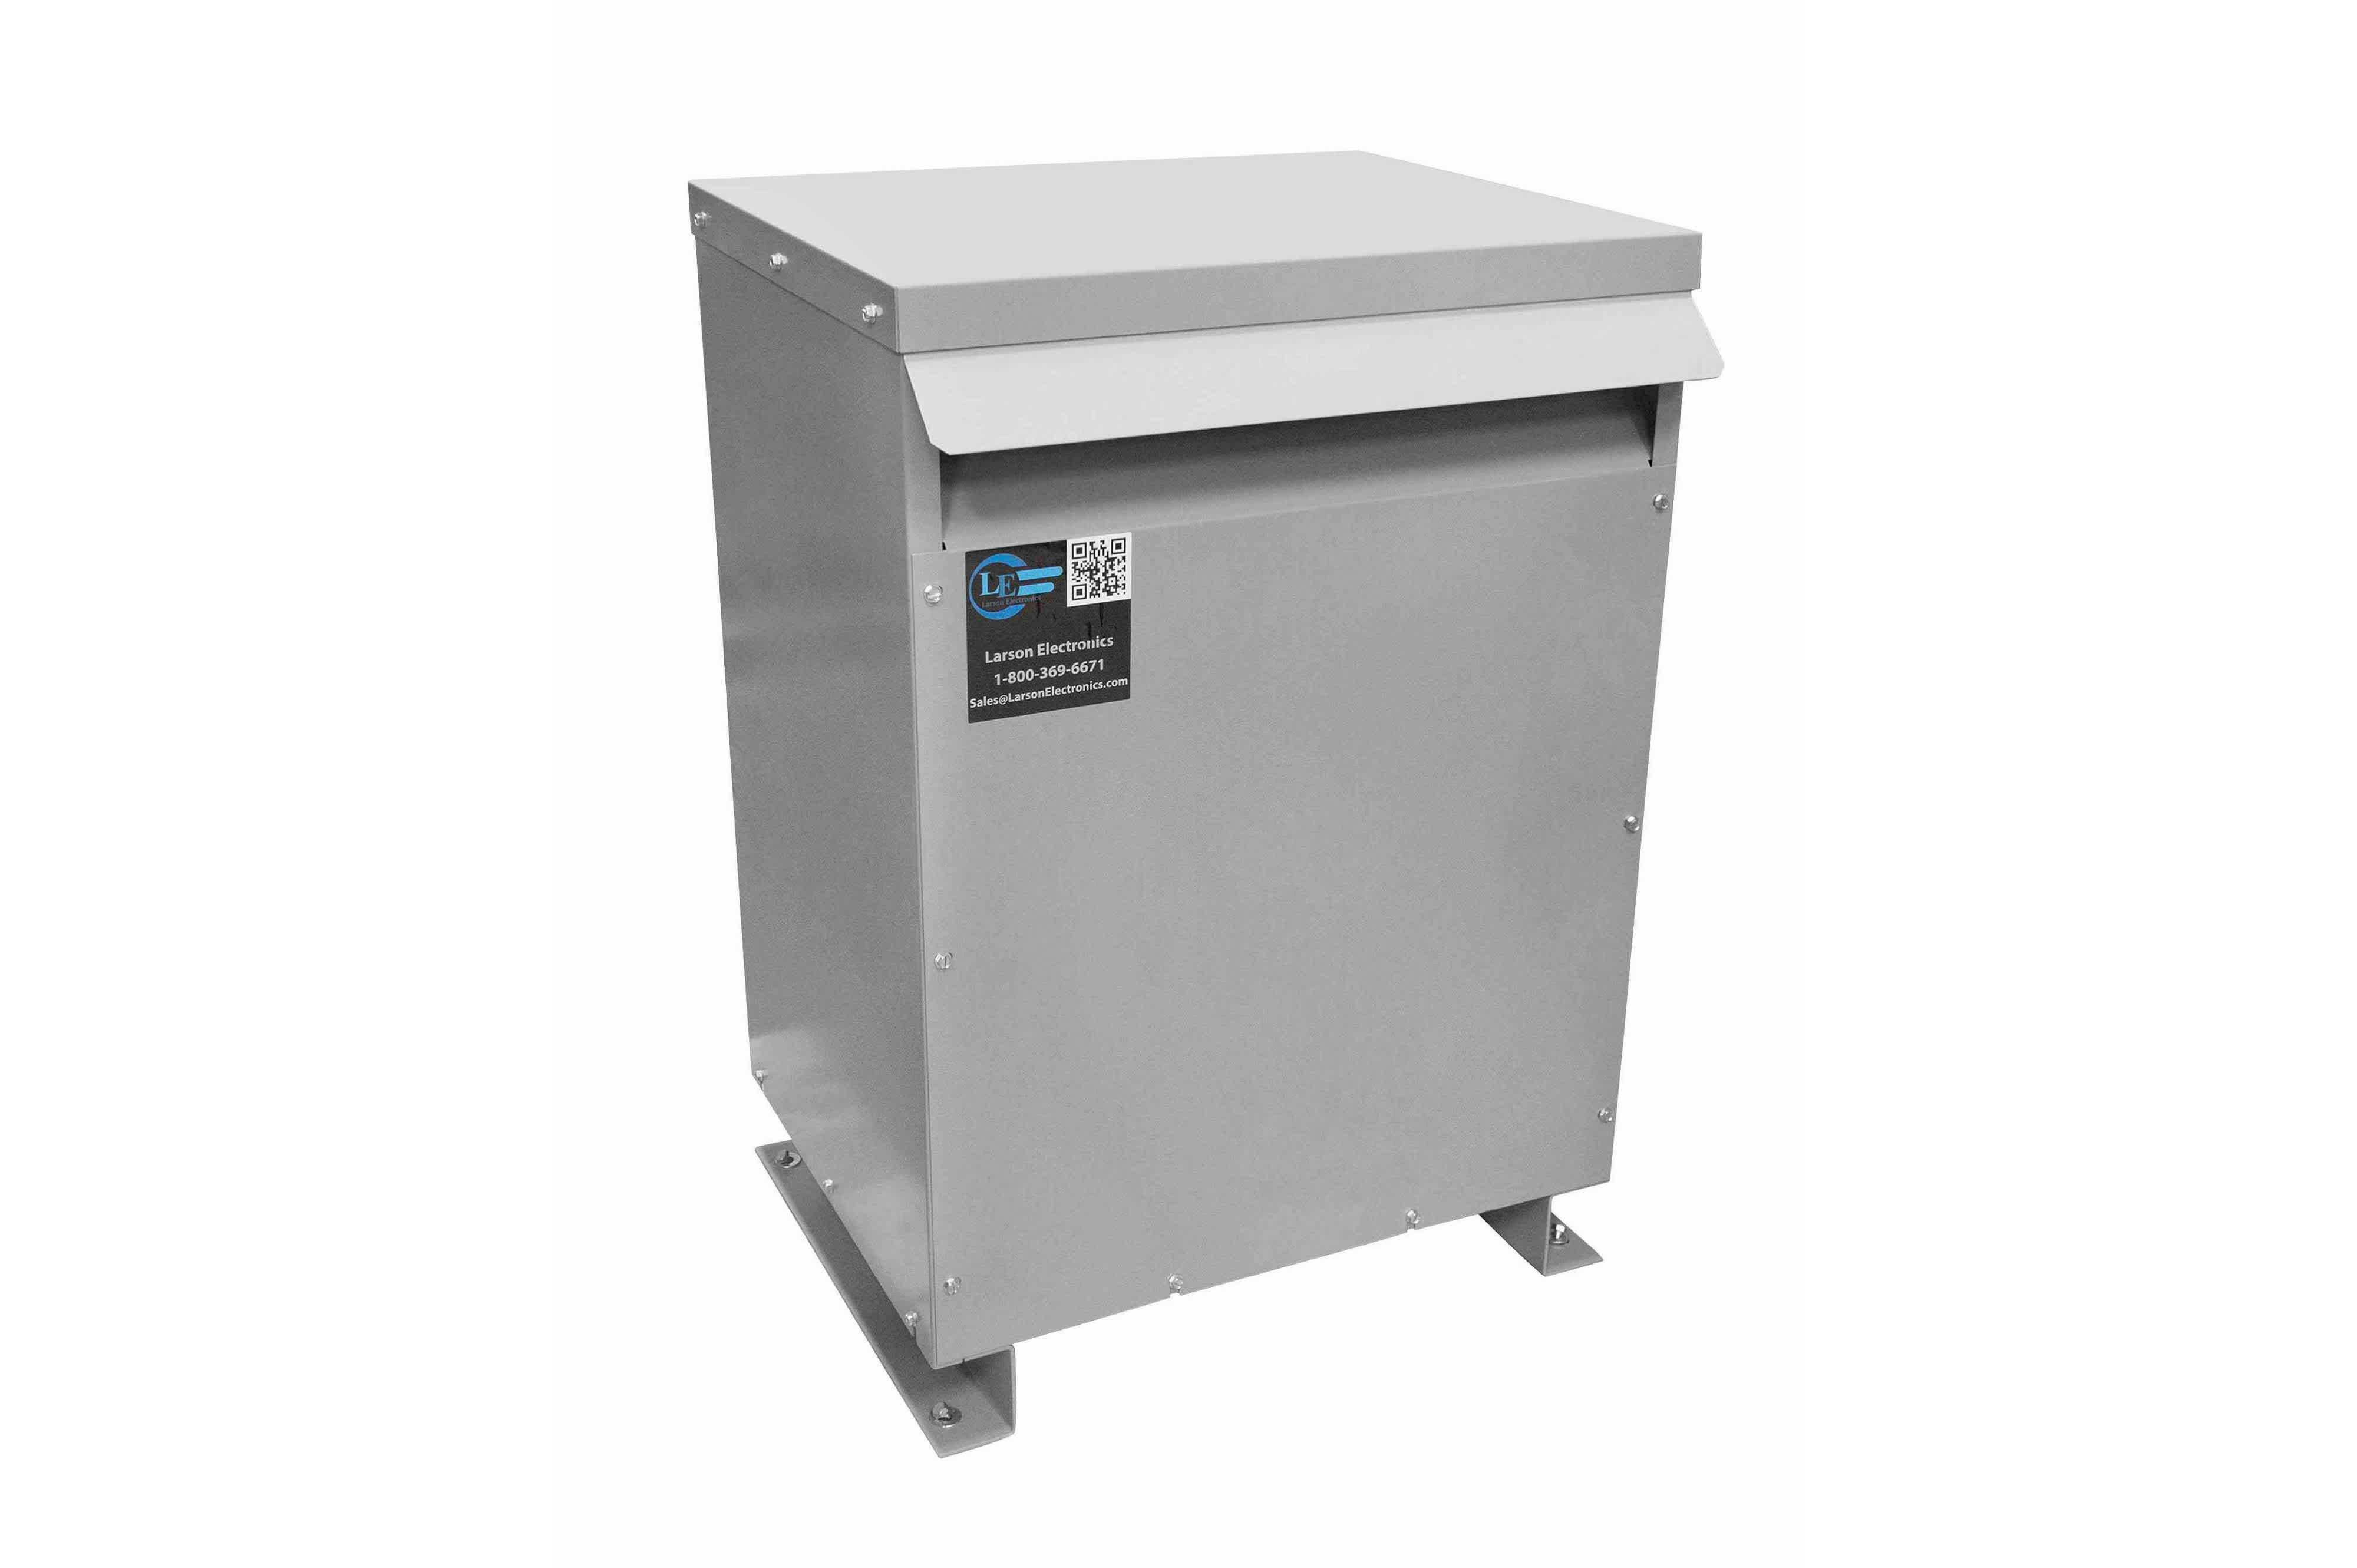 400 kVA 3PH Isolation Transformer, 480V Wye Primary, 380Y/220 Wye-N Secondary, N3R, Ventilated, 60 Hz